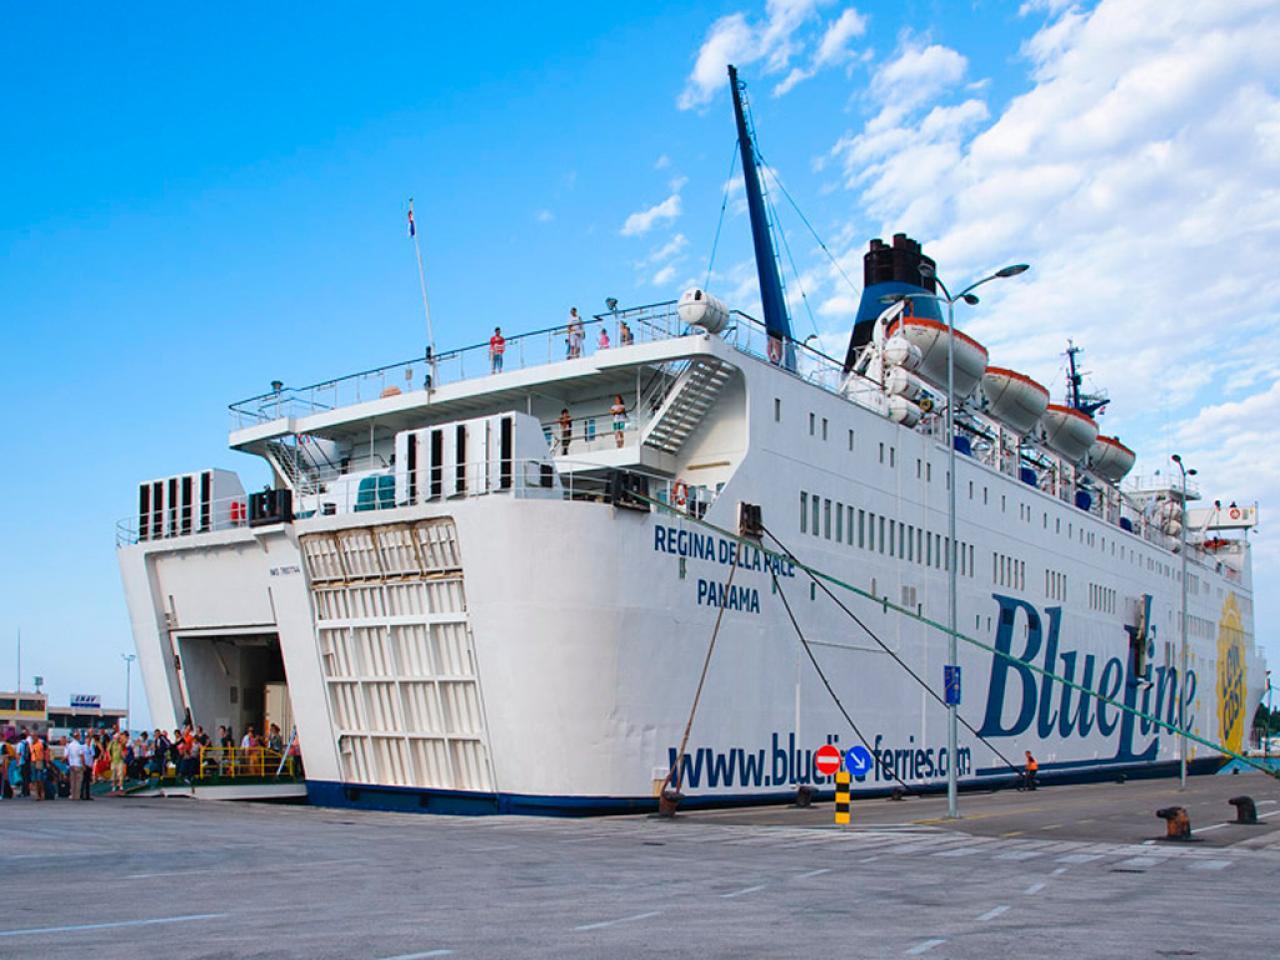 Book color line ferry - Blue Line Ferries Croatia